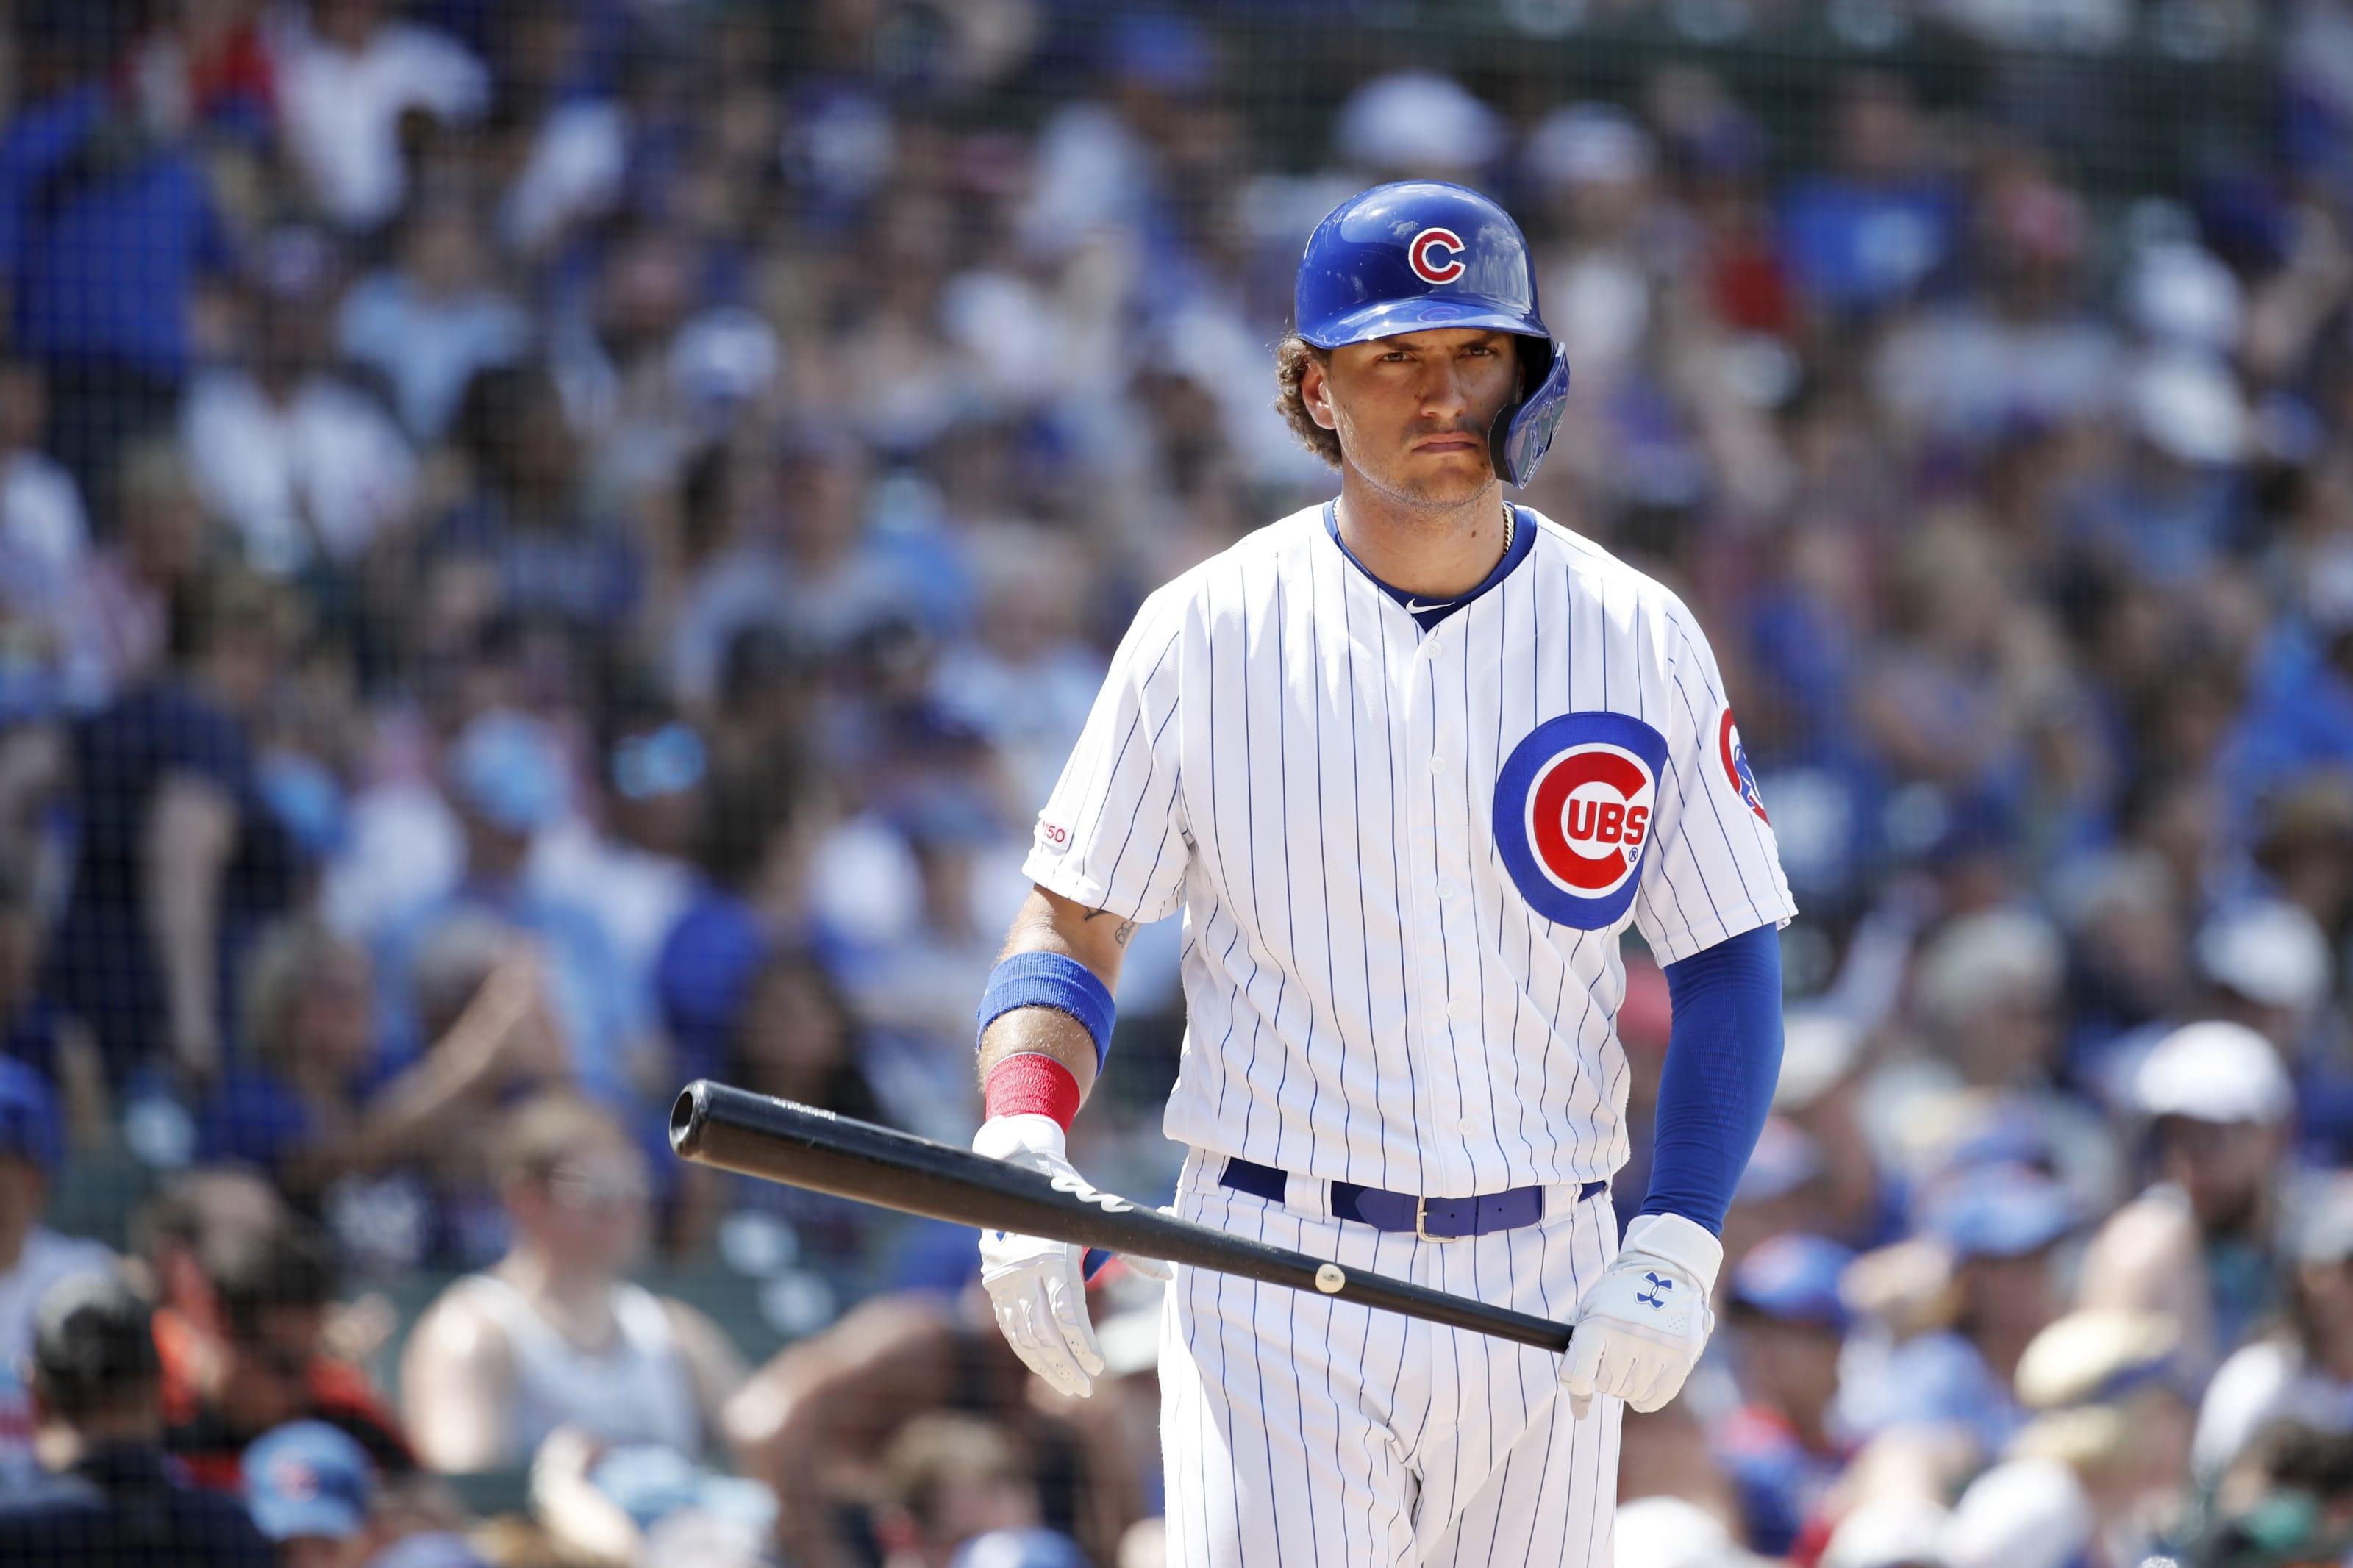 Chicago Cubs / Albert Almora